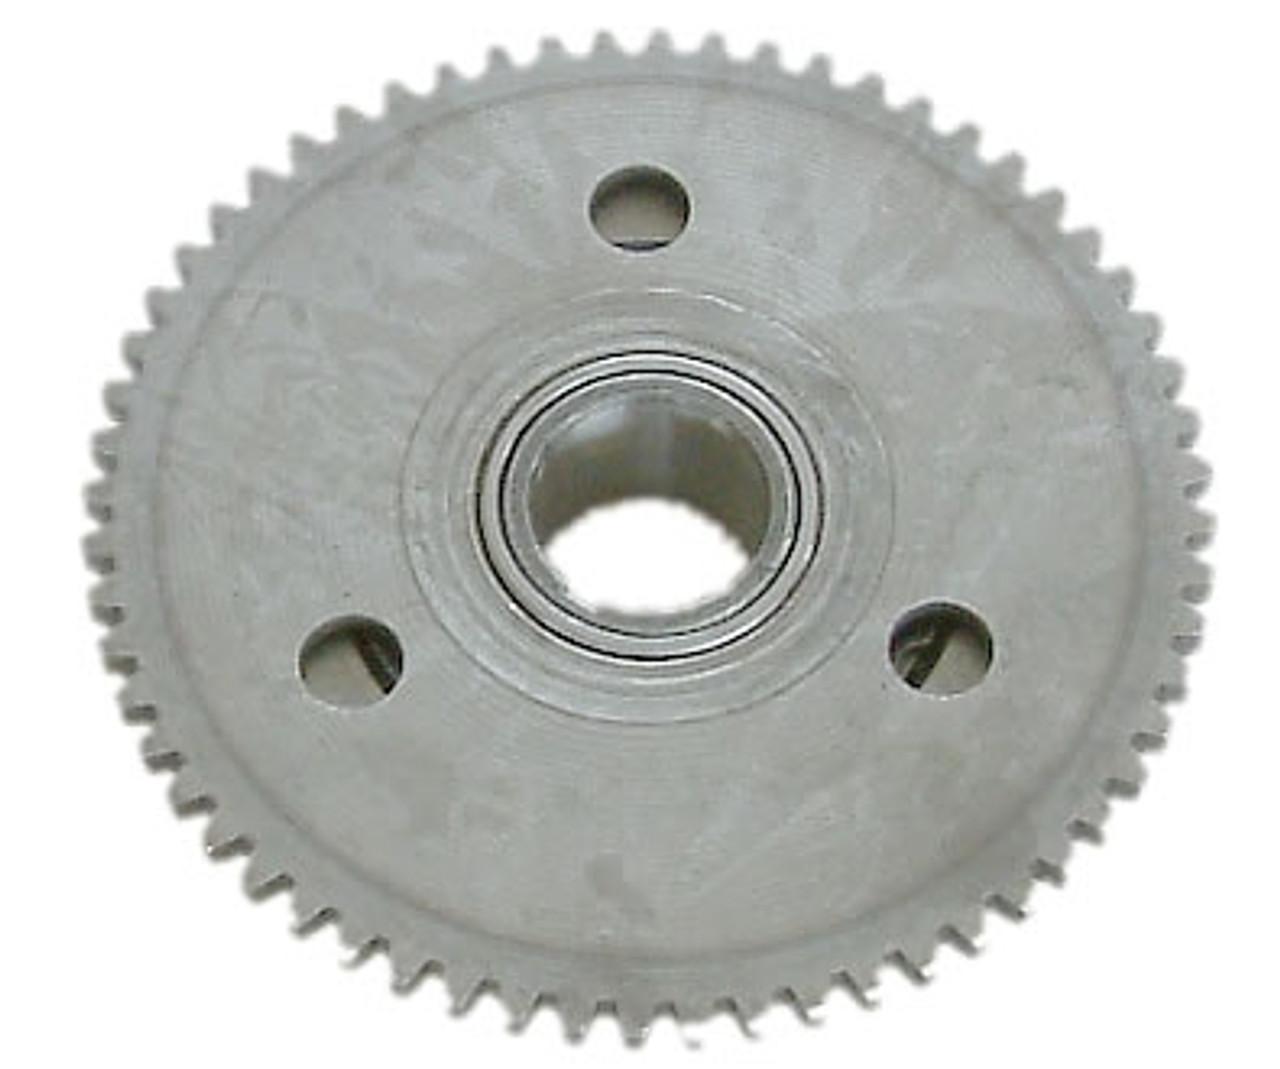 M150-1060001 / 513-1056 / 14369 / 152.06.100